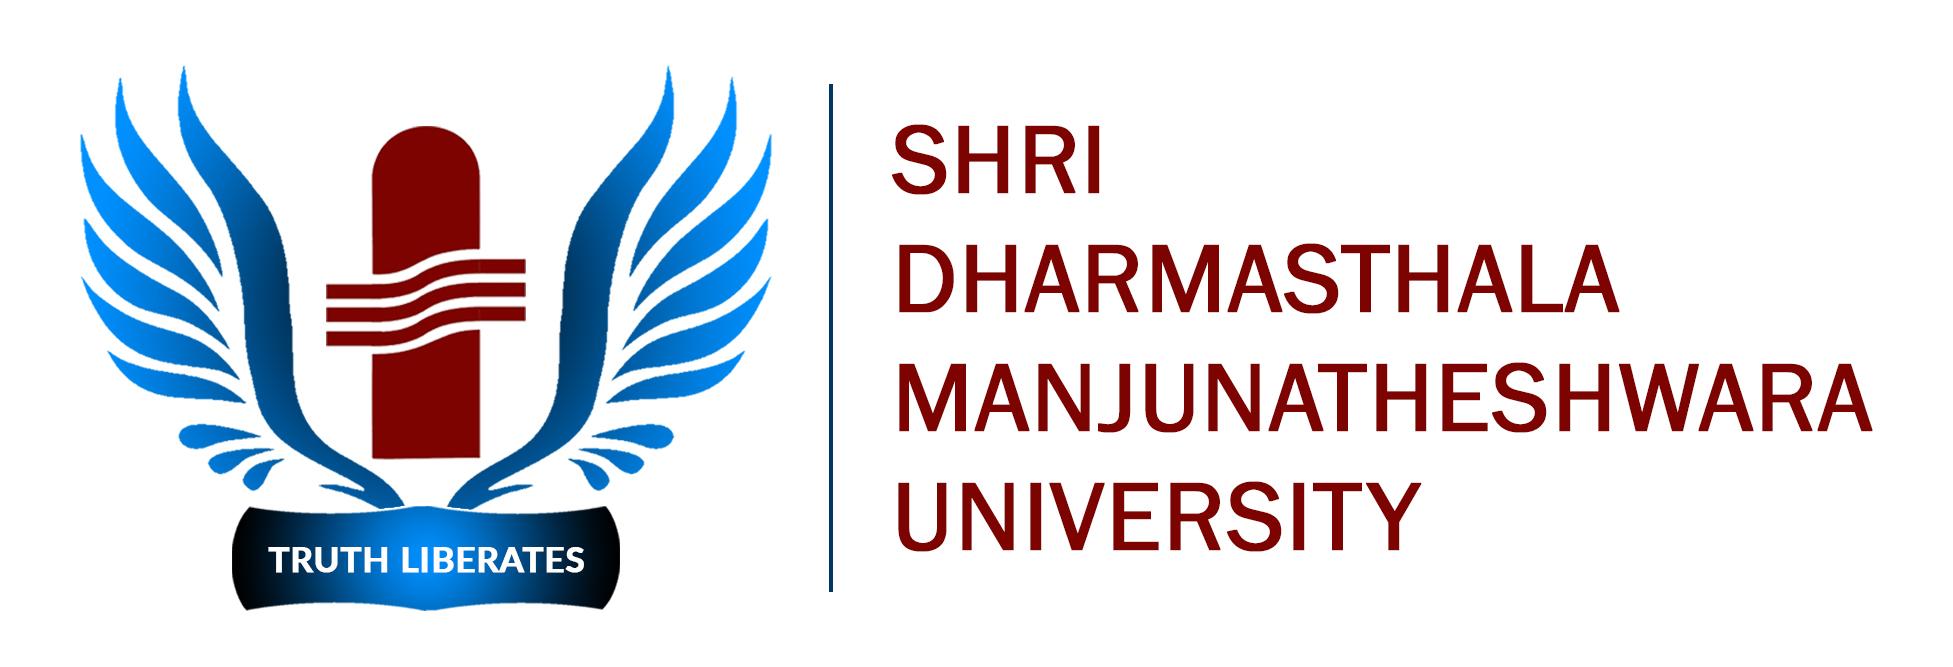 SDM University |  Shri Dharmasthala Manjunatheshwara University